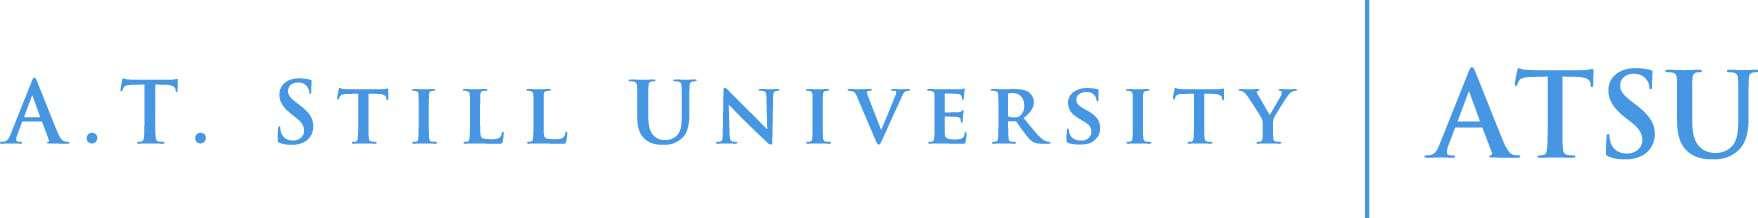 college of graduate health studies a t still university logo 127115